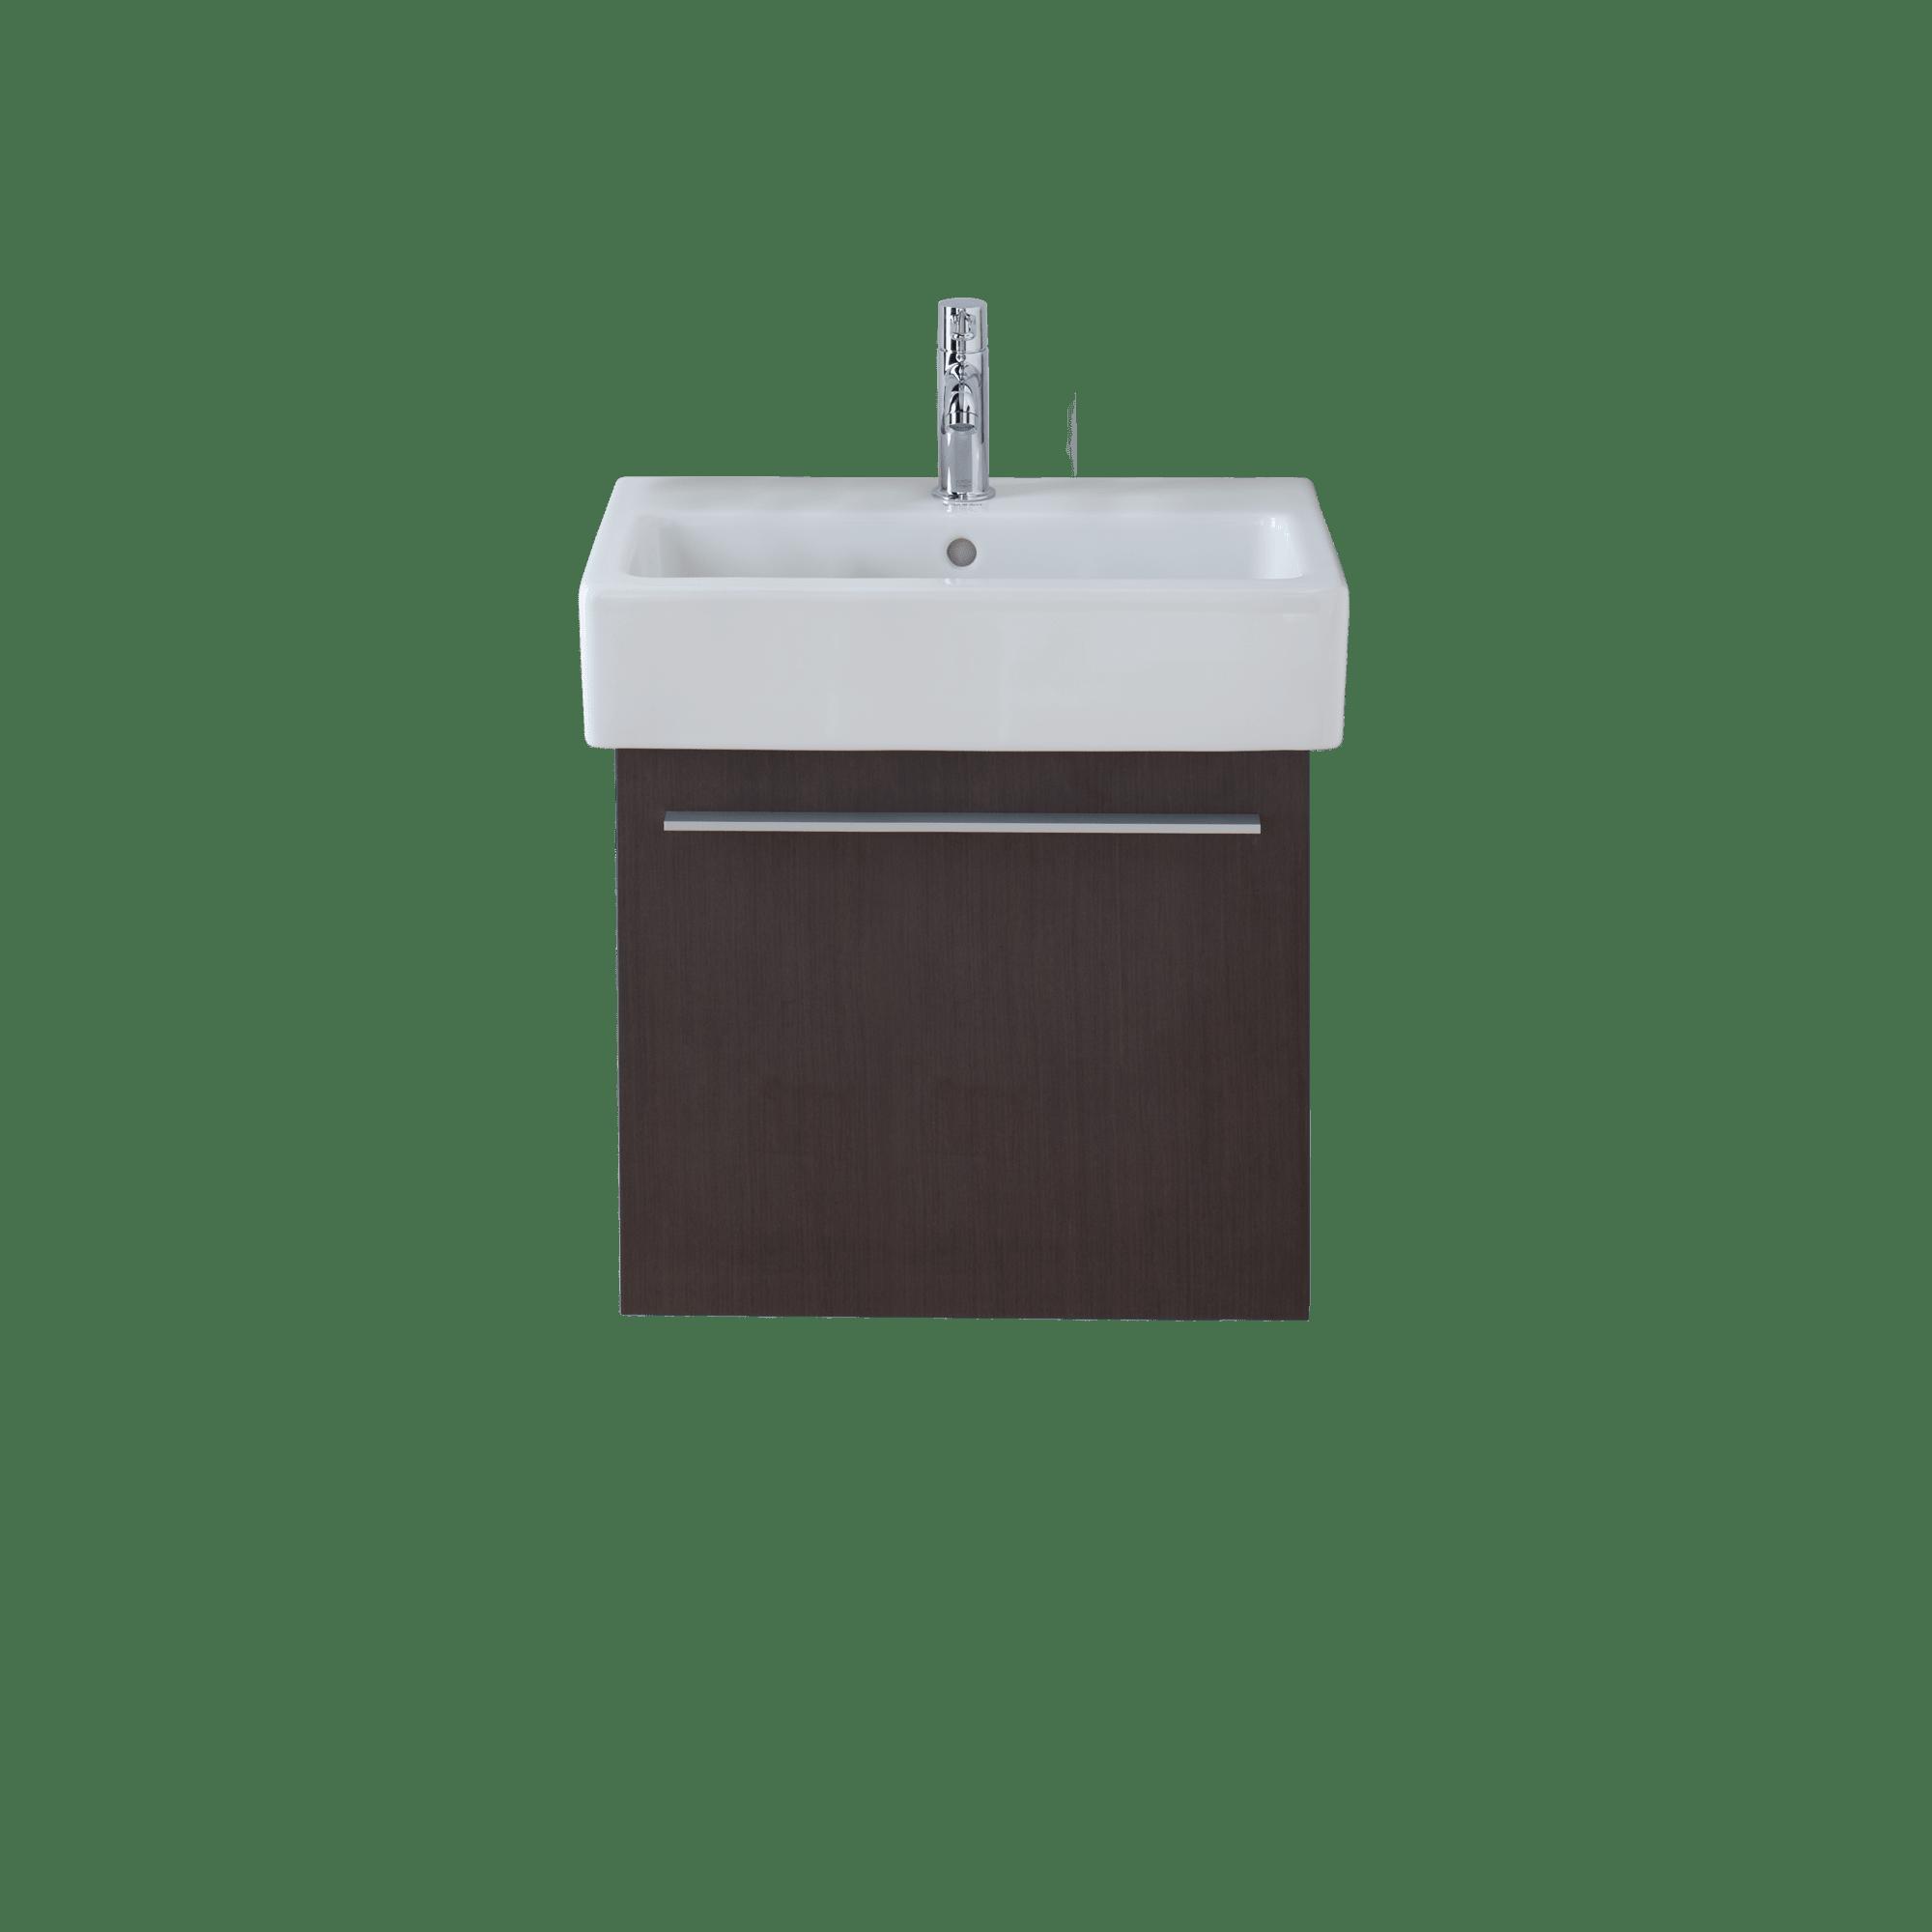 Duravit XL6044 X-large Wall Mounted Vanity Unit | QualityBath.com